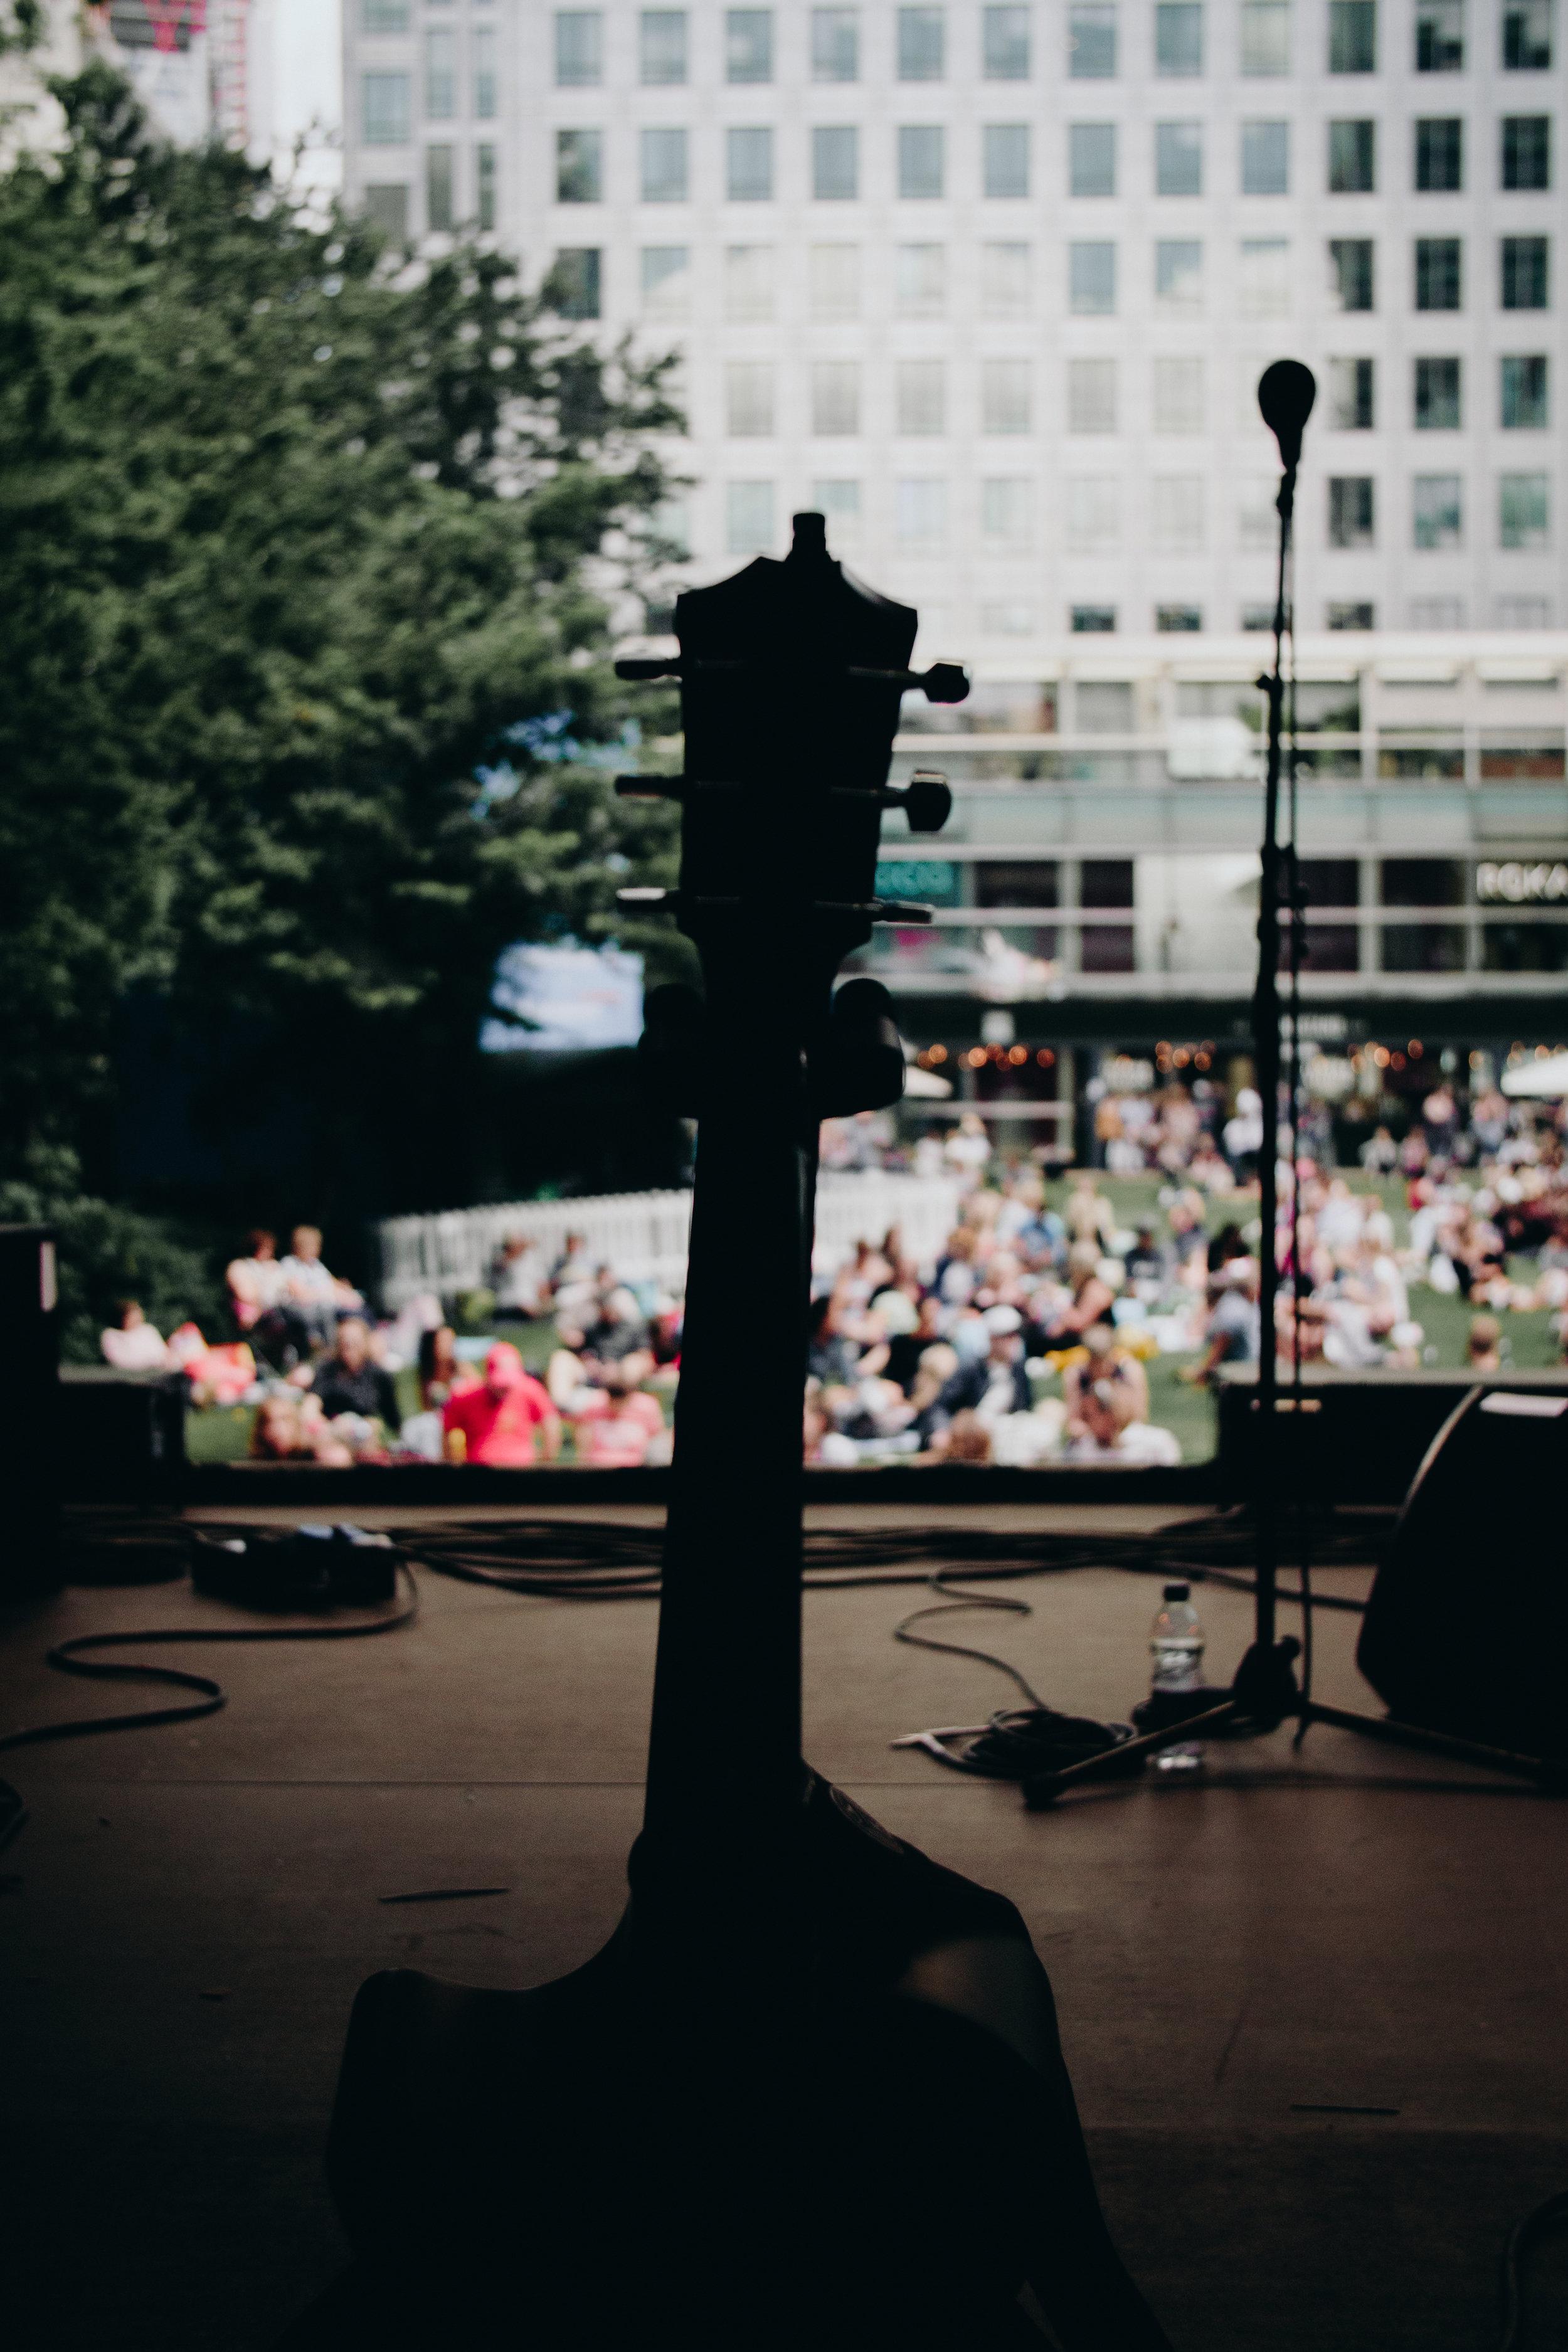 jade-helliwell--nashville-meets-london--4_42565418410_o.jpg